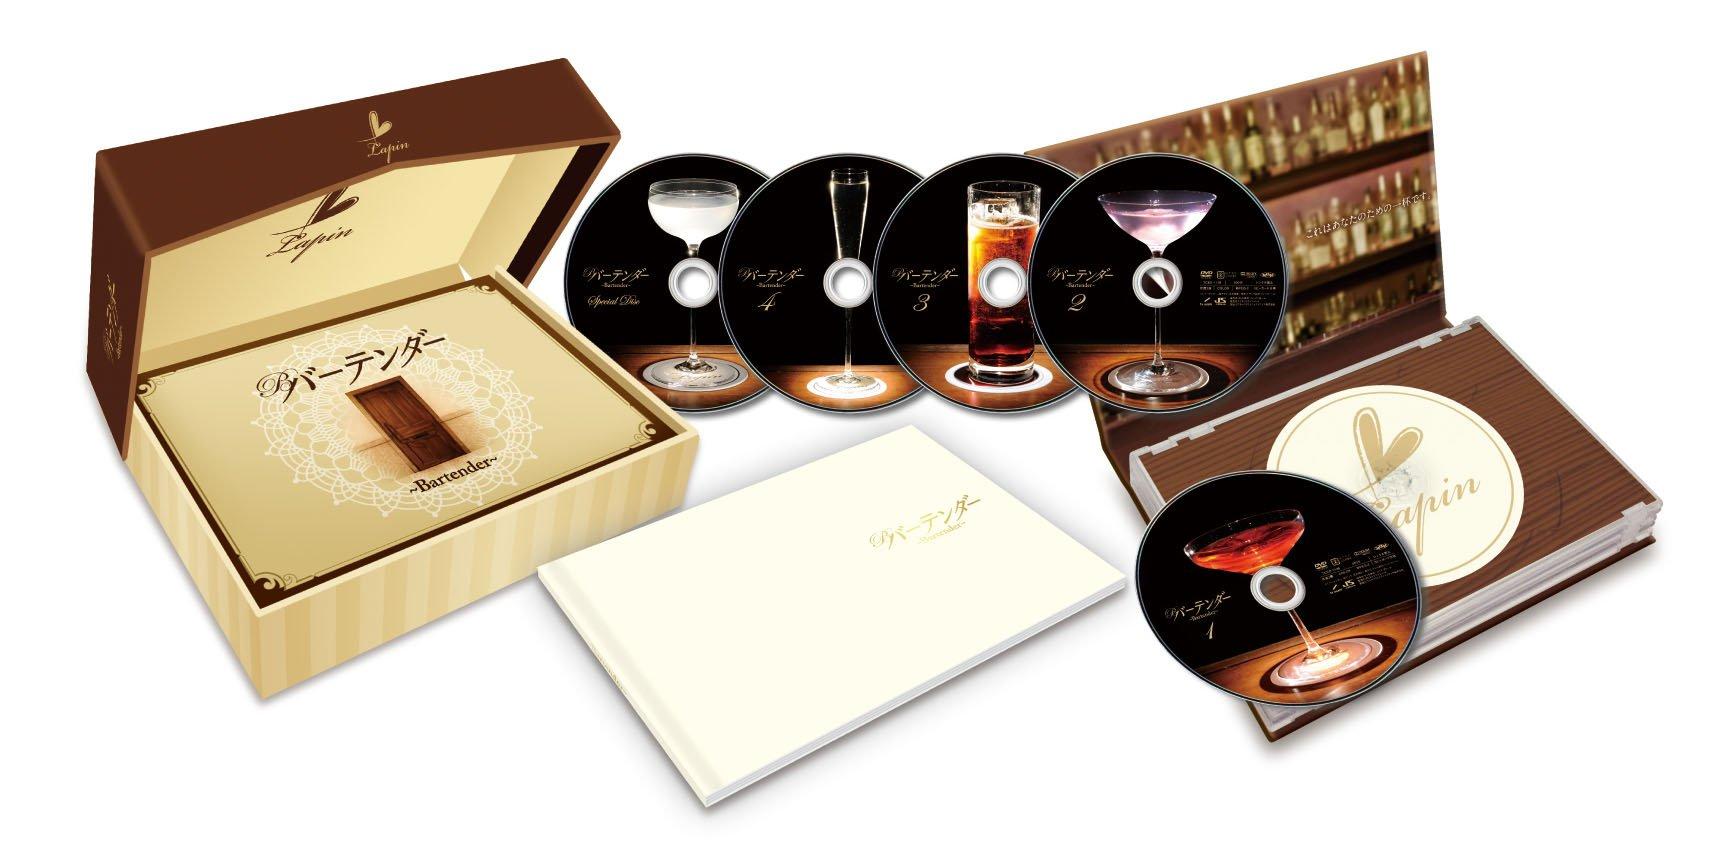 Bartender tv box blu ray disc for Bat box obi